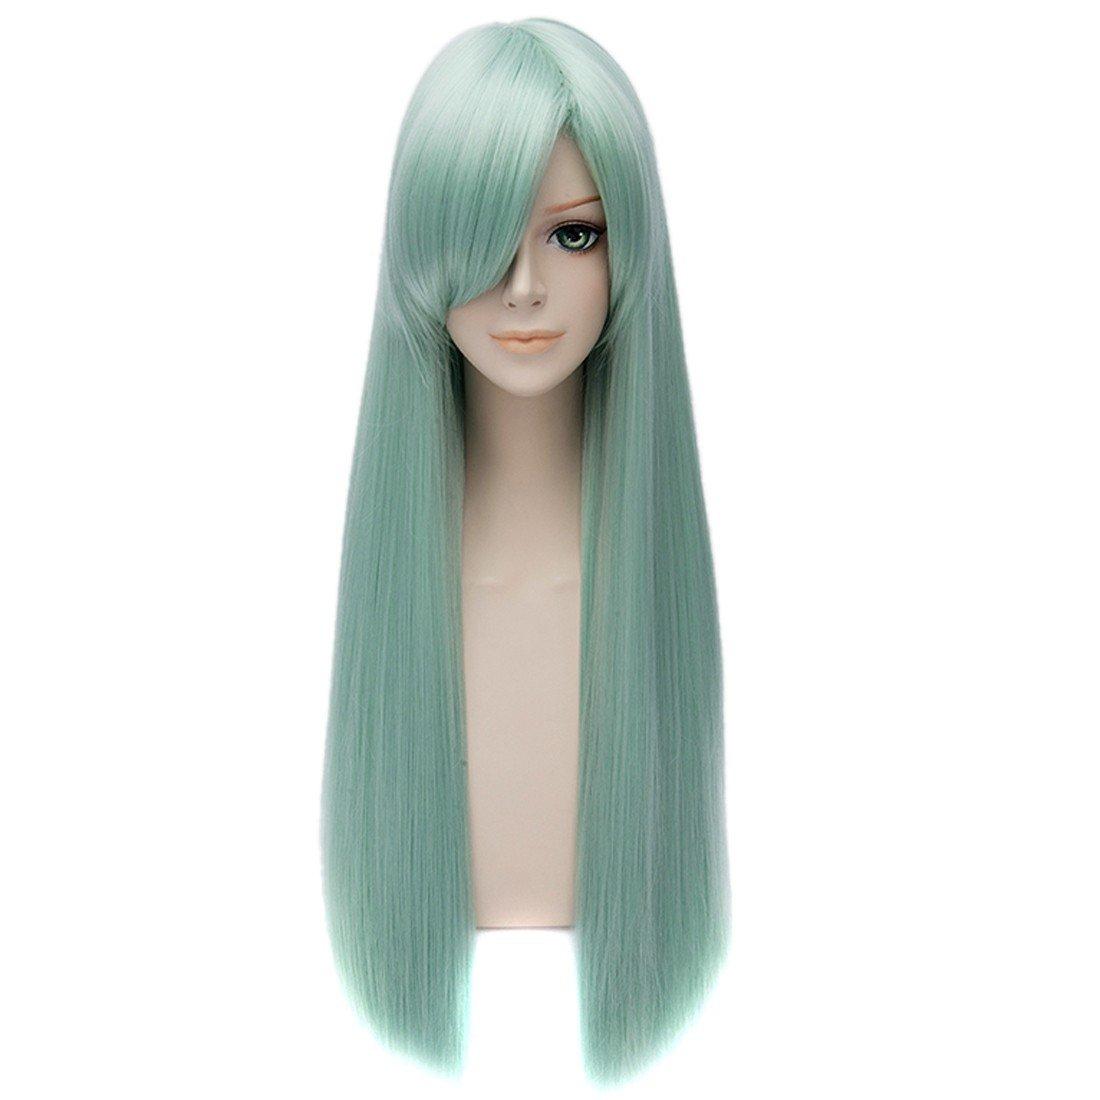 The Seven Deadly Sins Elizabeth Liones Green Straight Long Women Cosplay Wigs QIYUN.Z W111A1163/1ONE